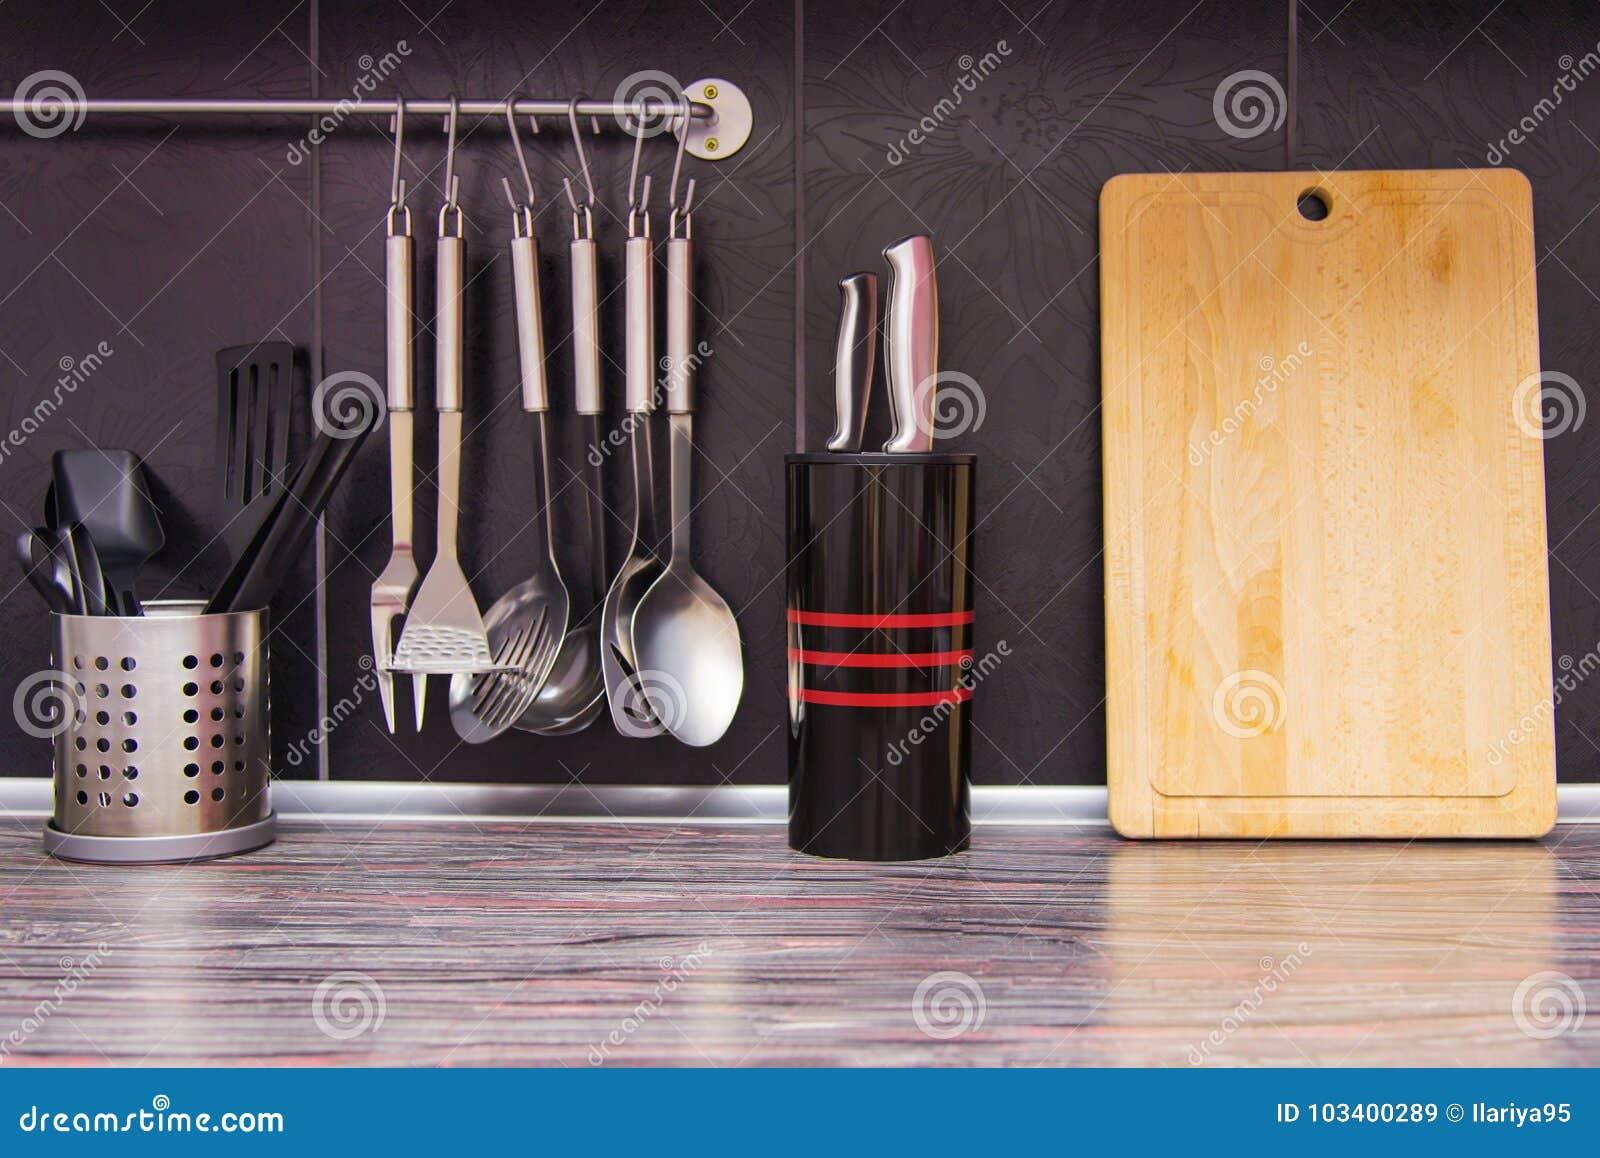 Black Kitchen With Kitchen Utensils Stock Image - Image of ...